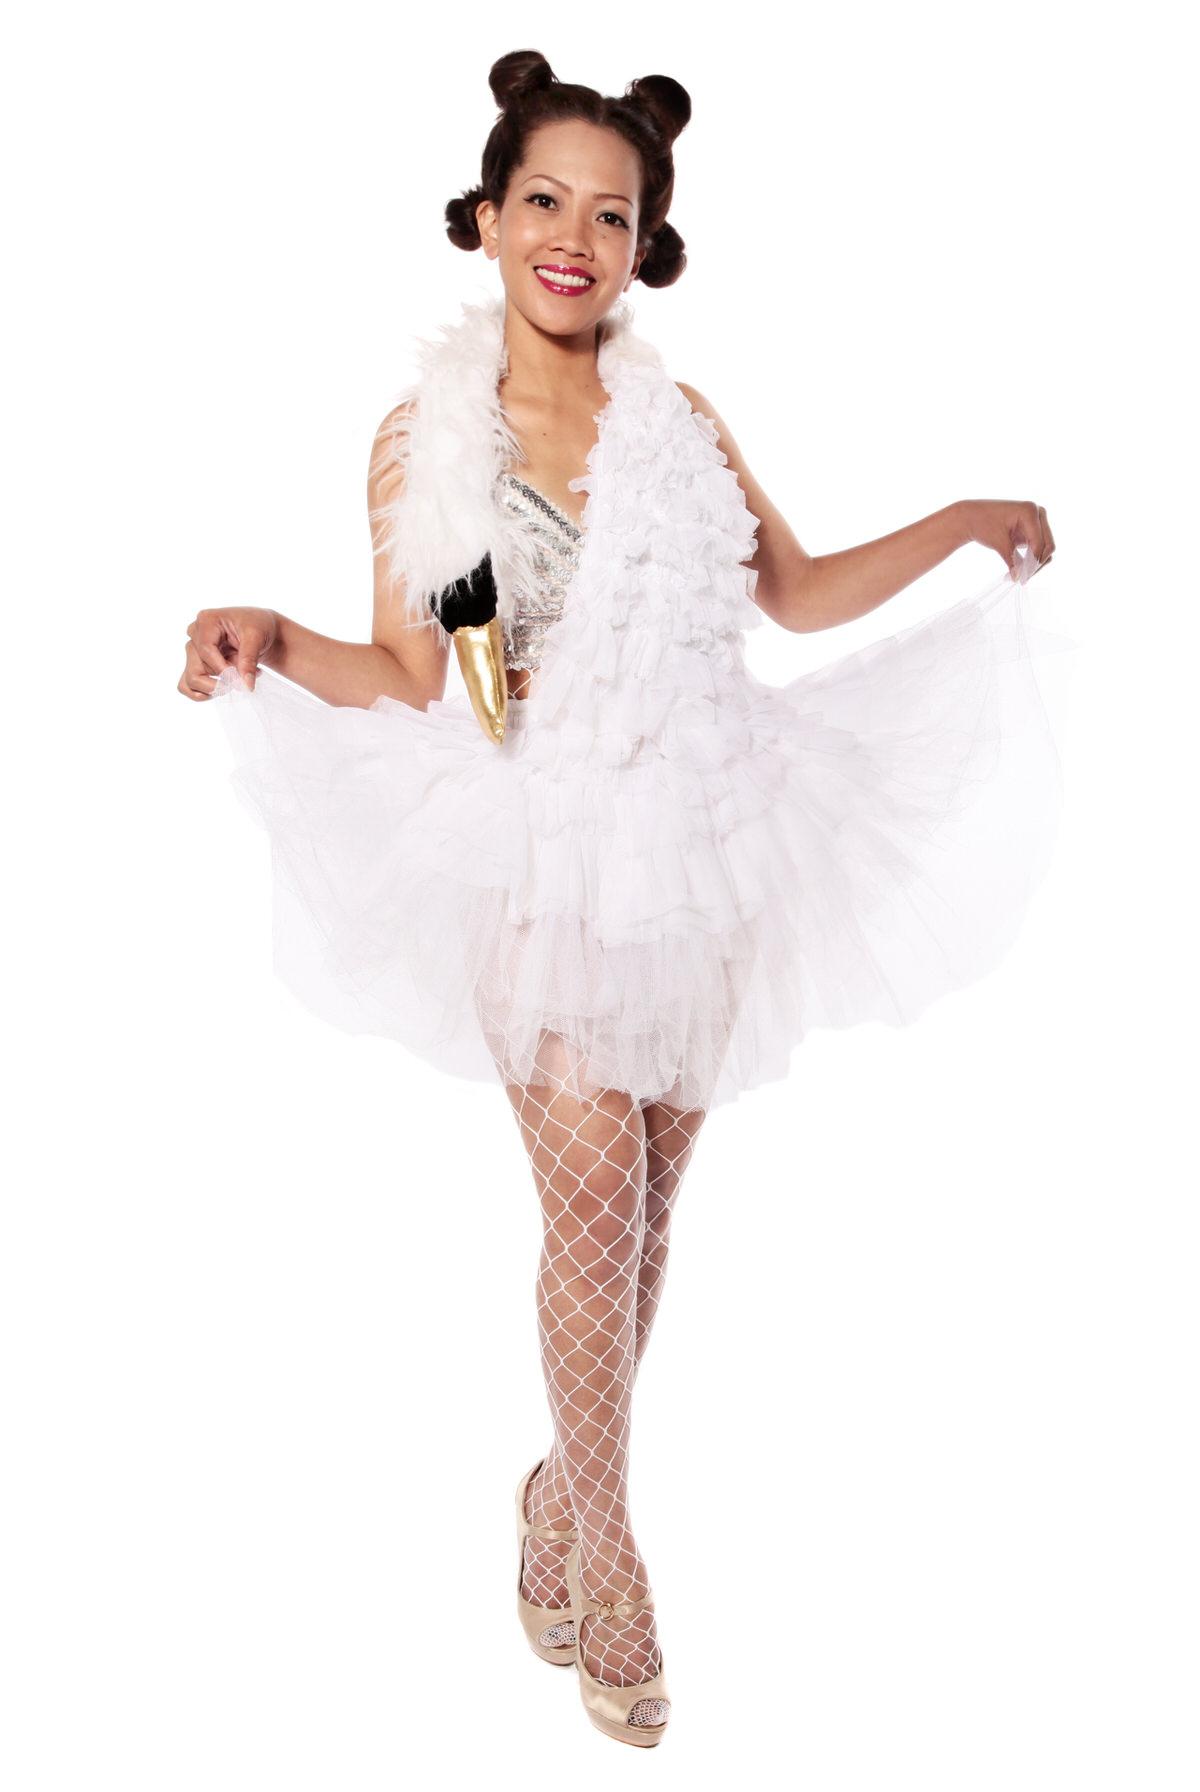 SWAN DRESS BJORK STYLE COSTUME W SILVER SEQUIN TOP